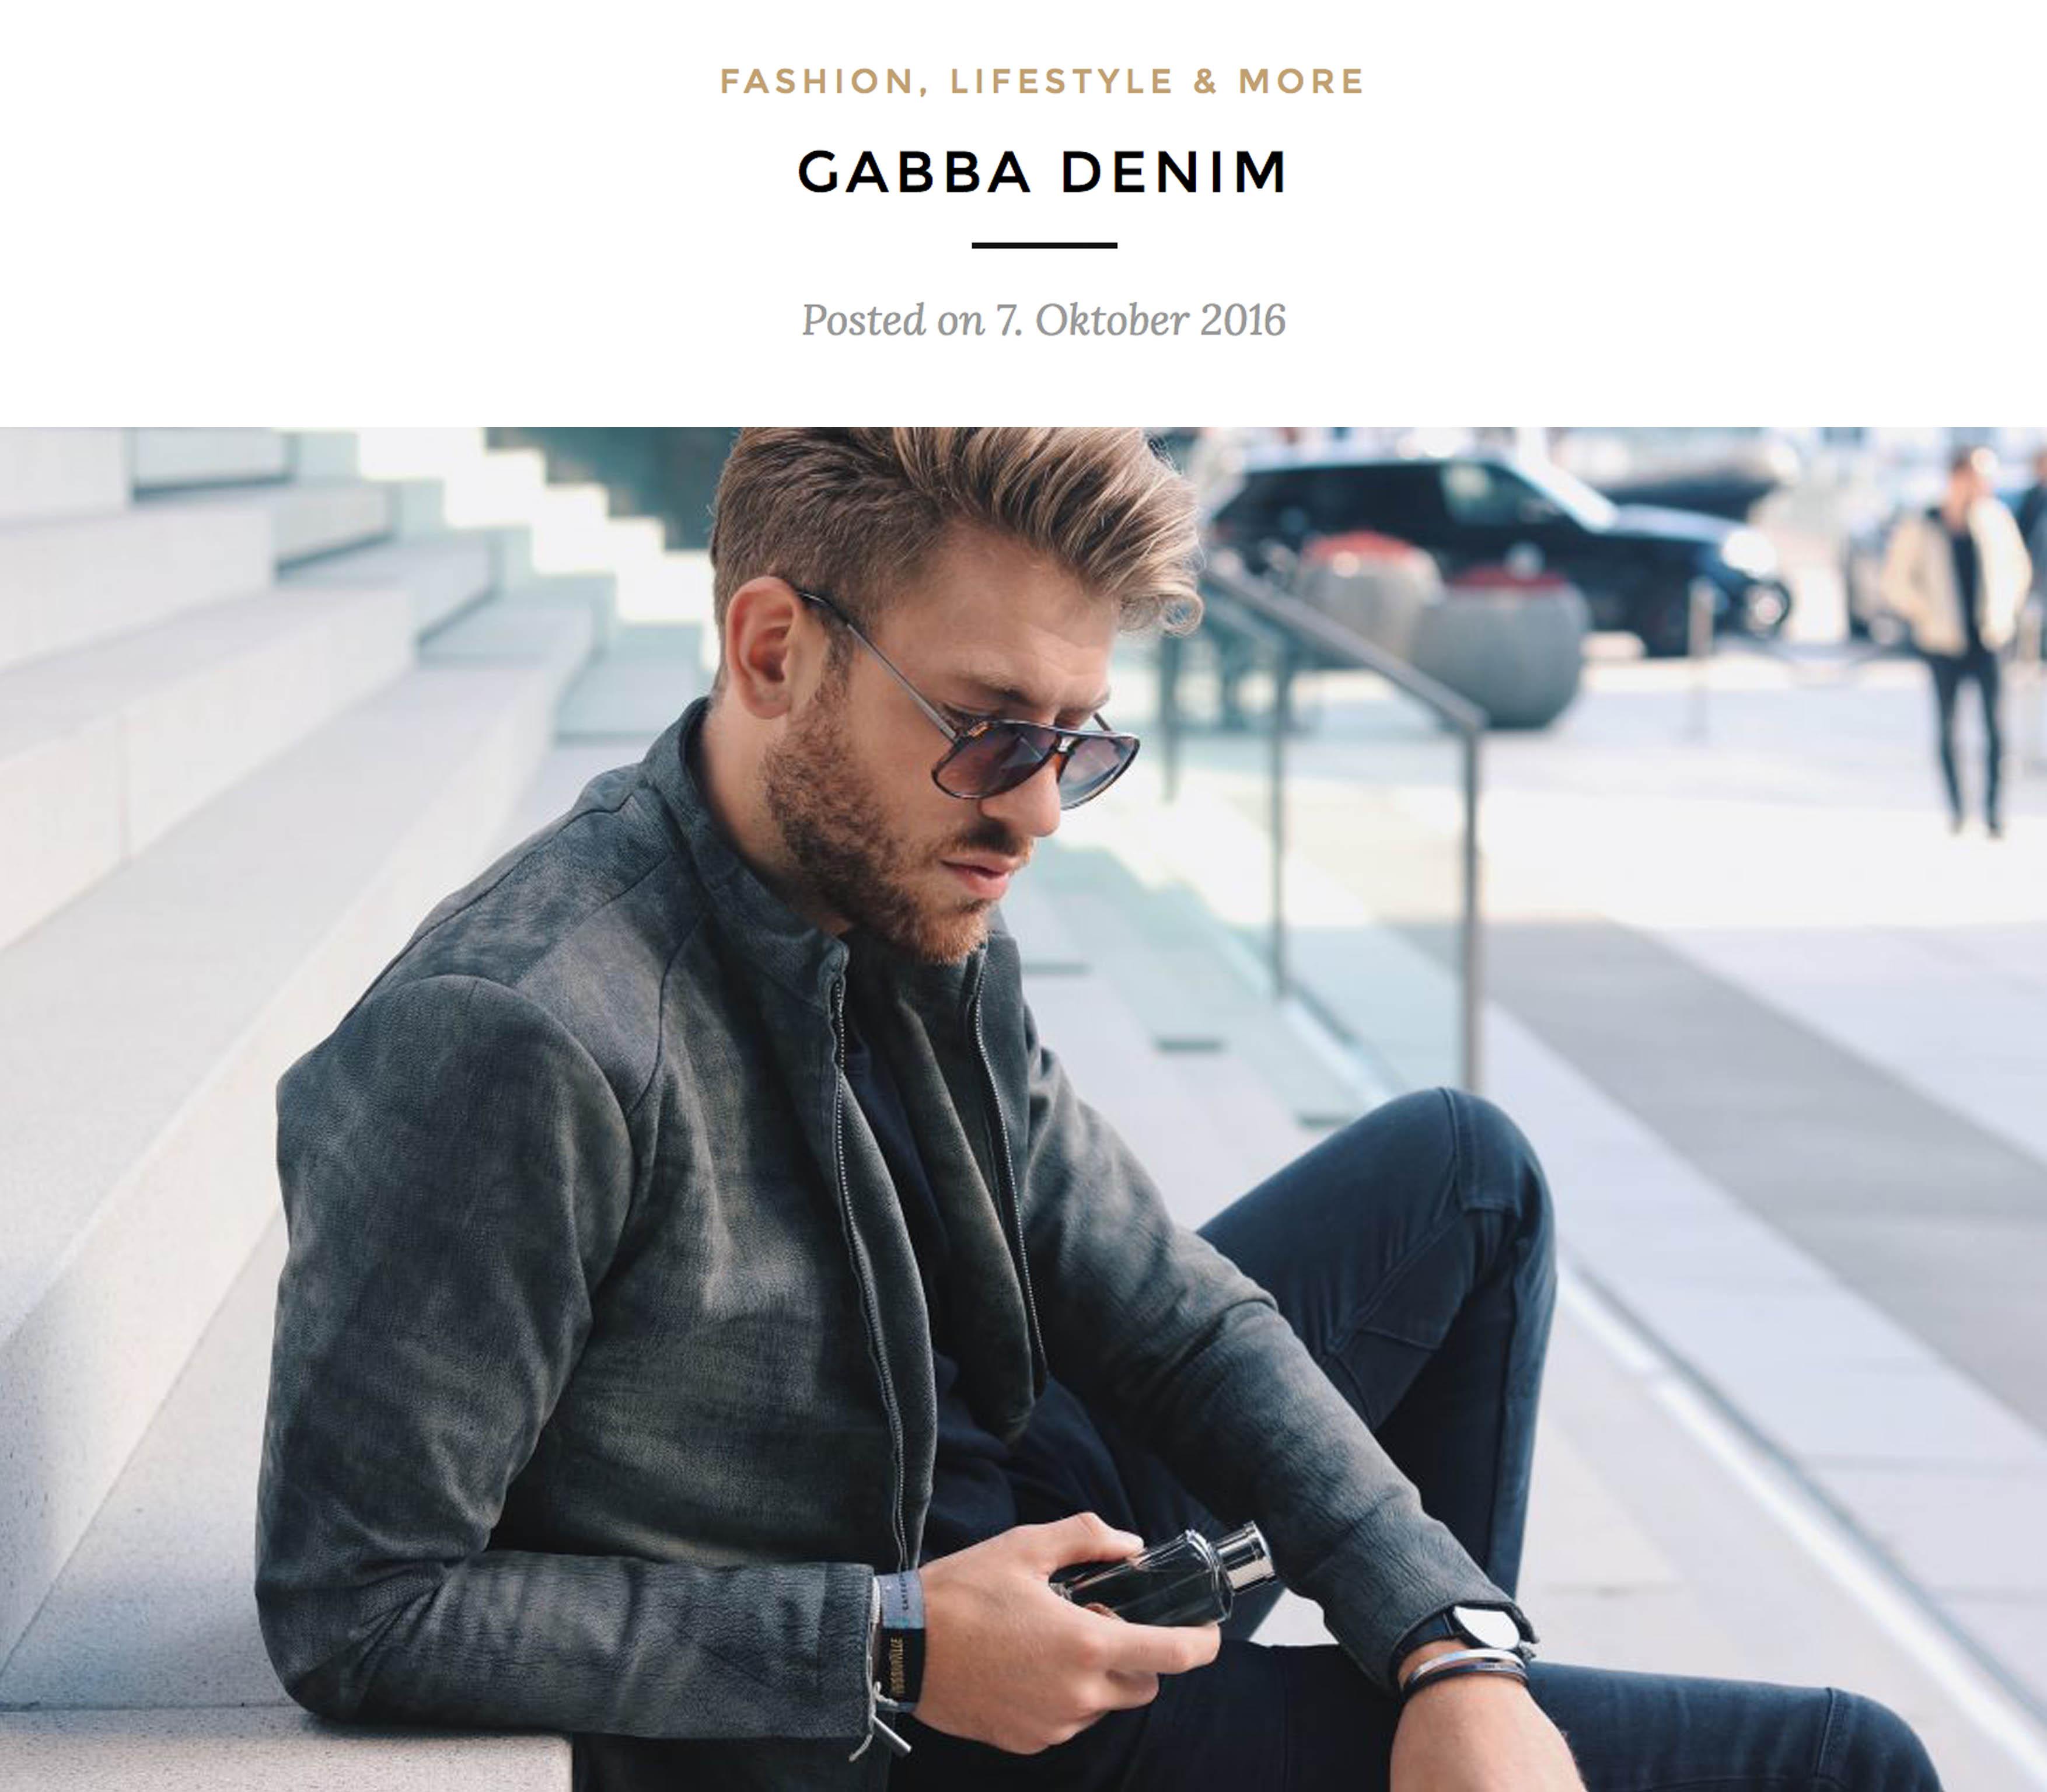 Gabba Denim Fashion Streetstyle Streetshoot Lederjacke